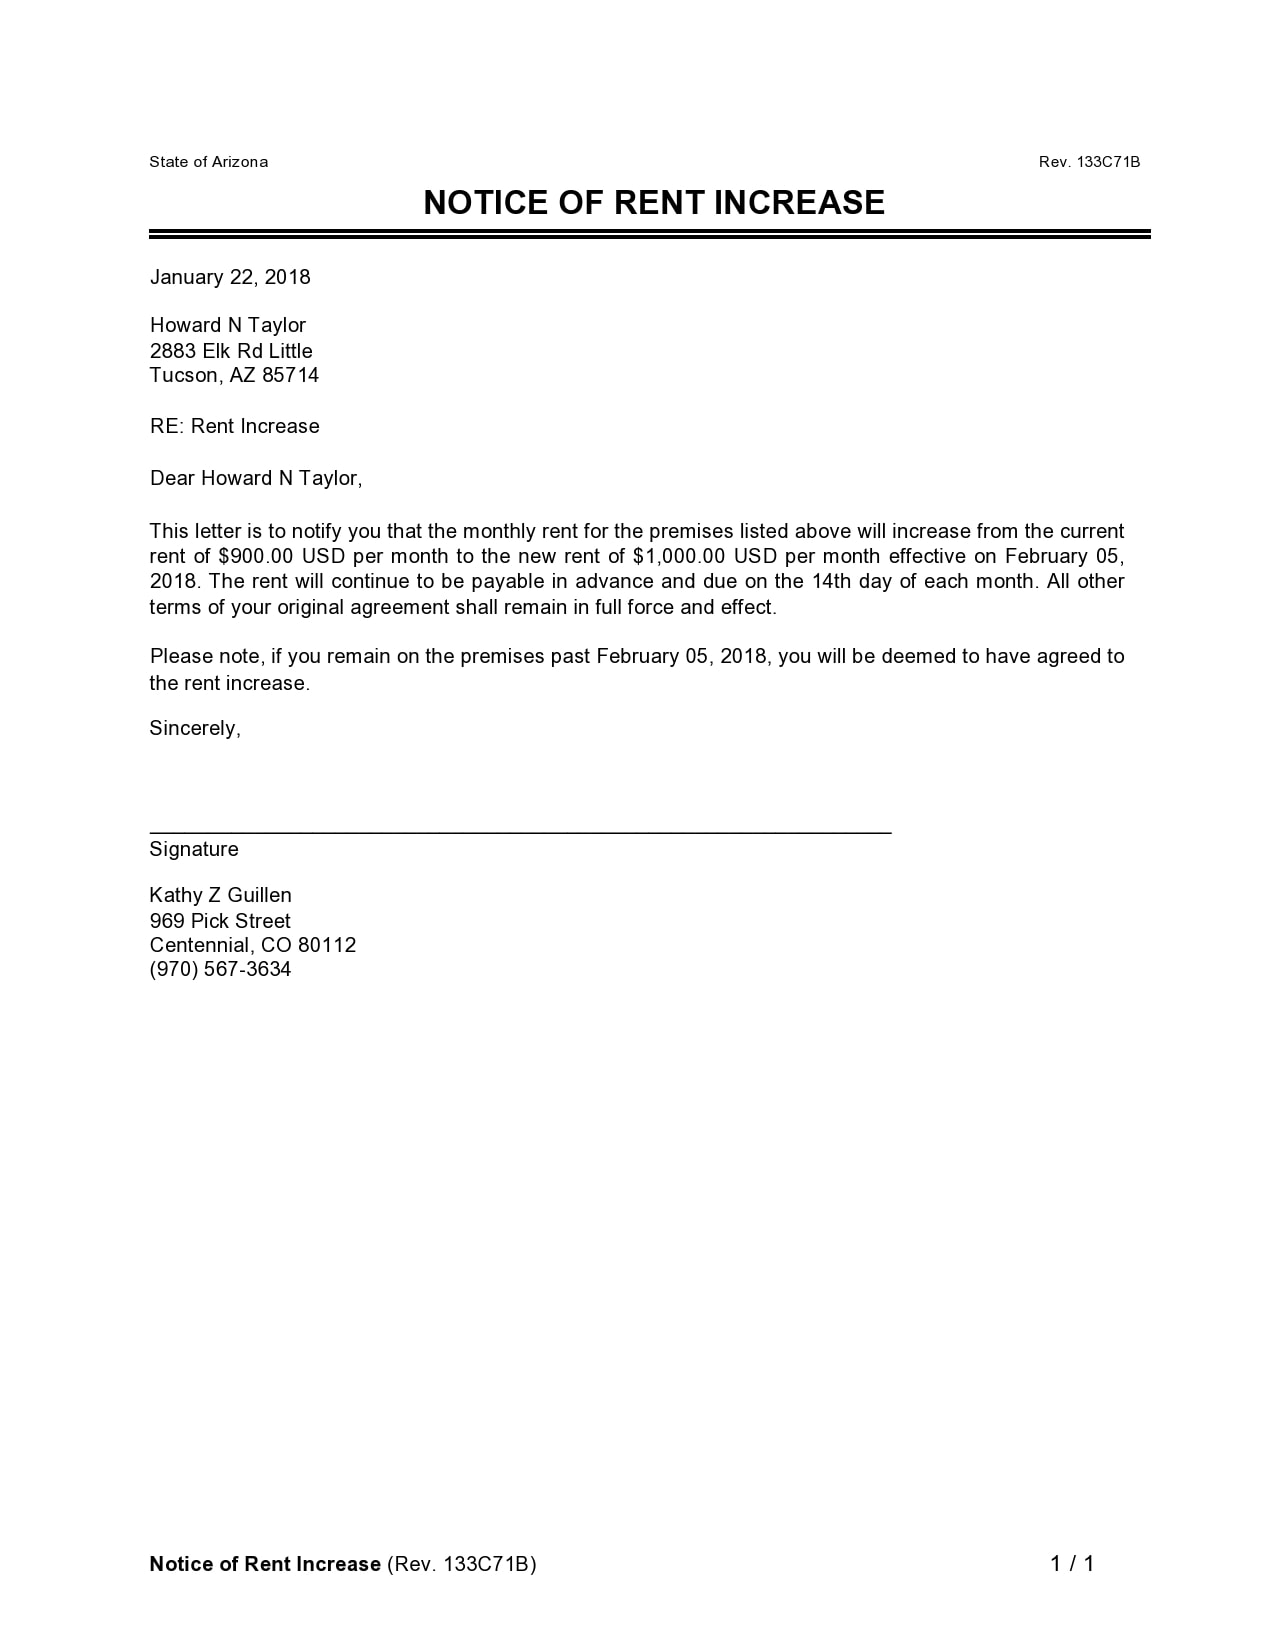 rent increase notice 27